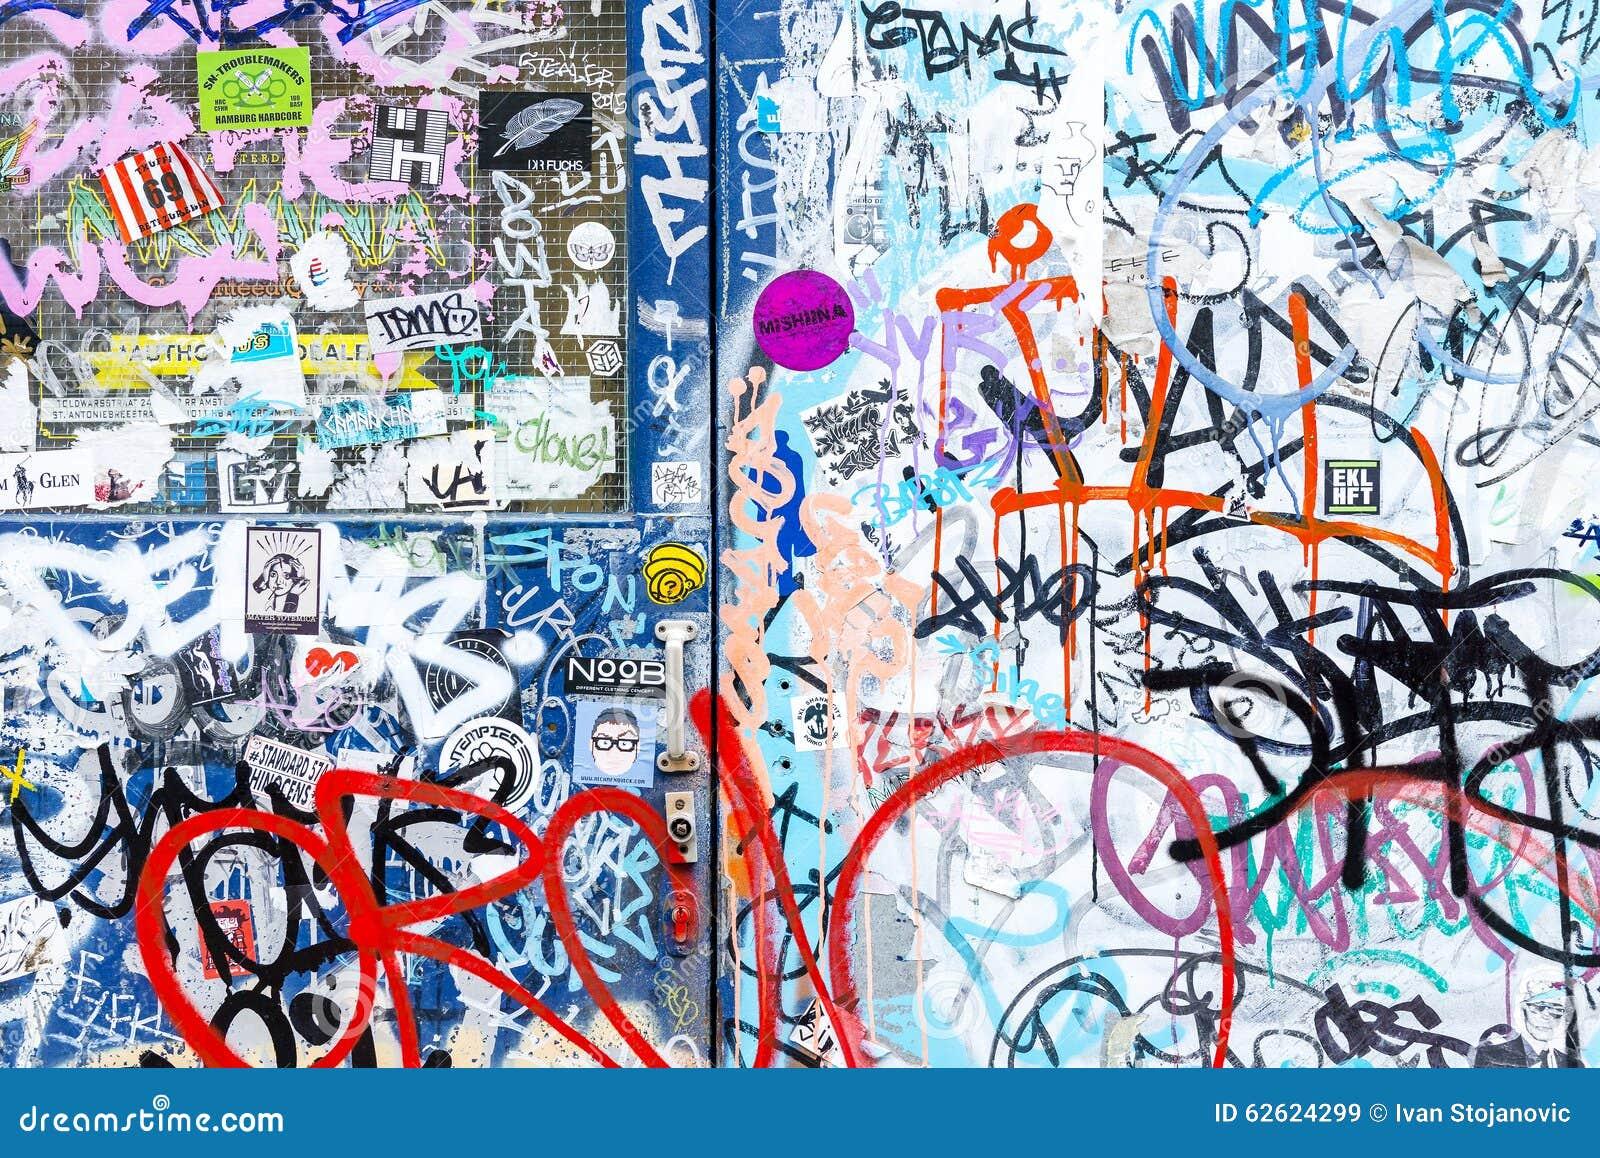 Download graffiti creator java - Download Aplikasi Graffiti Creator Java Sticker And Graffiti Wall Background Editorial Stock Image Image